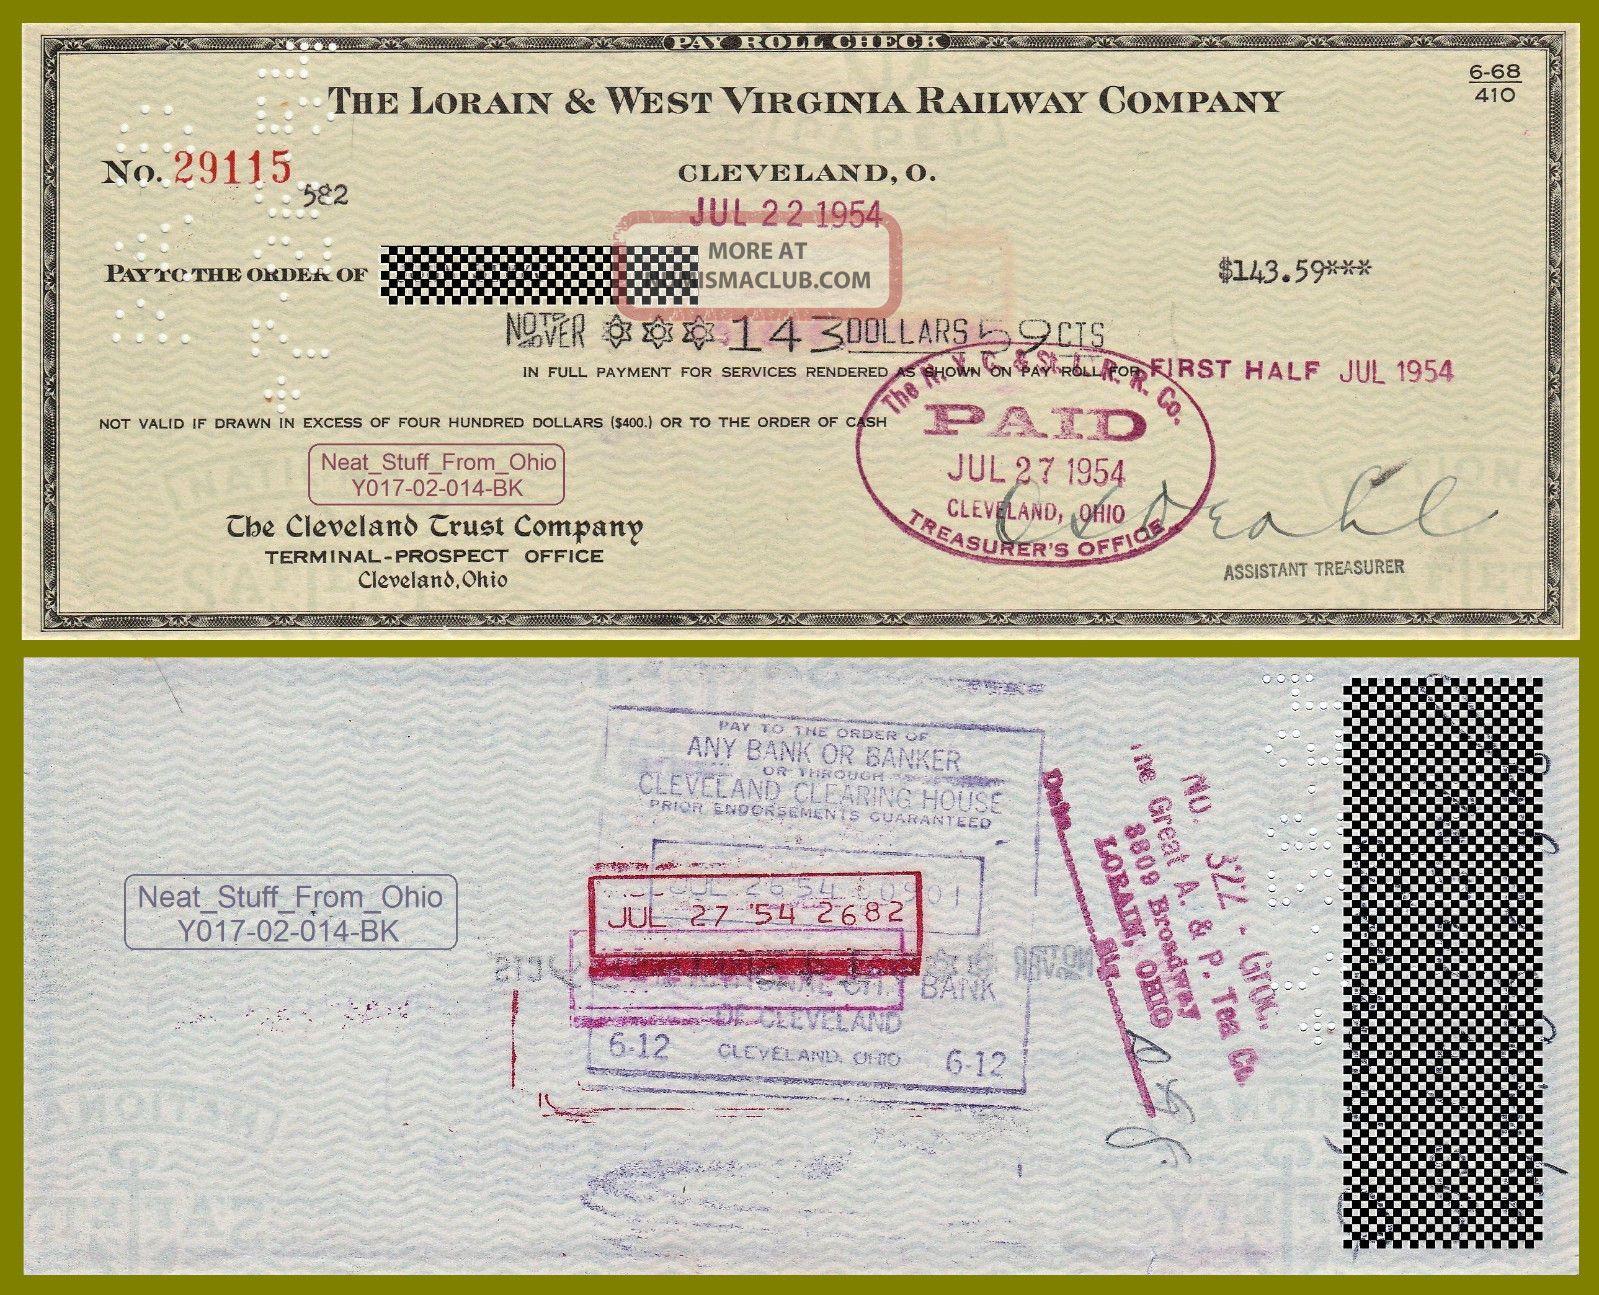 Lorain & West Virginia Railway Company - 1954 Employee Paycheck - Item Transportation photo